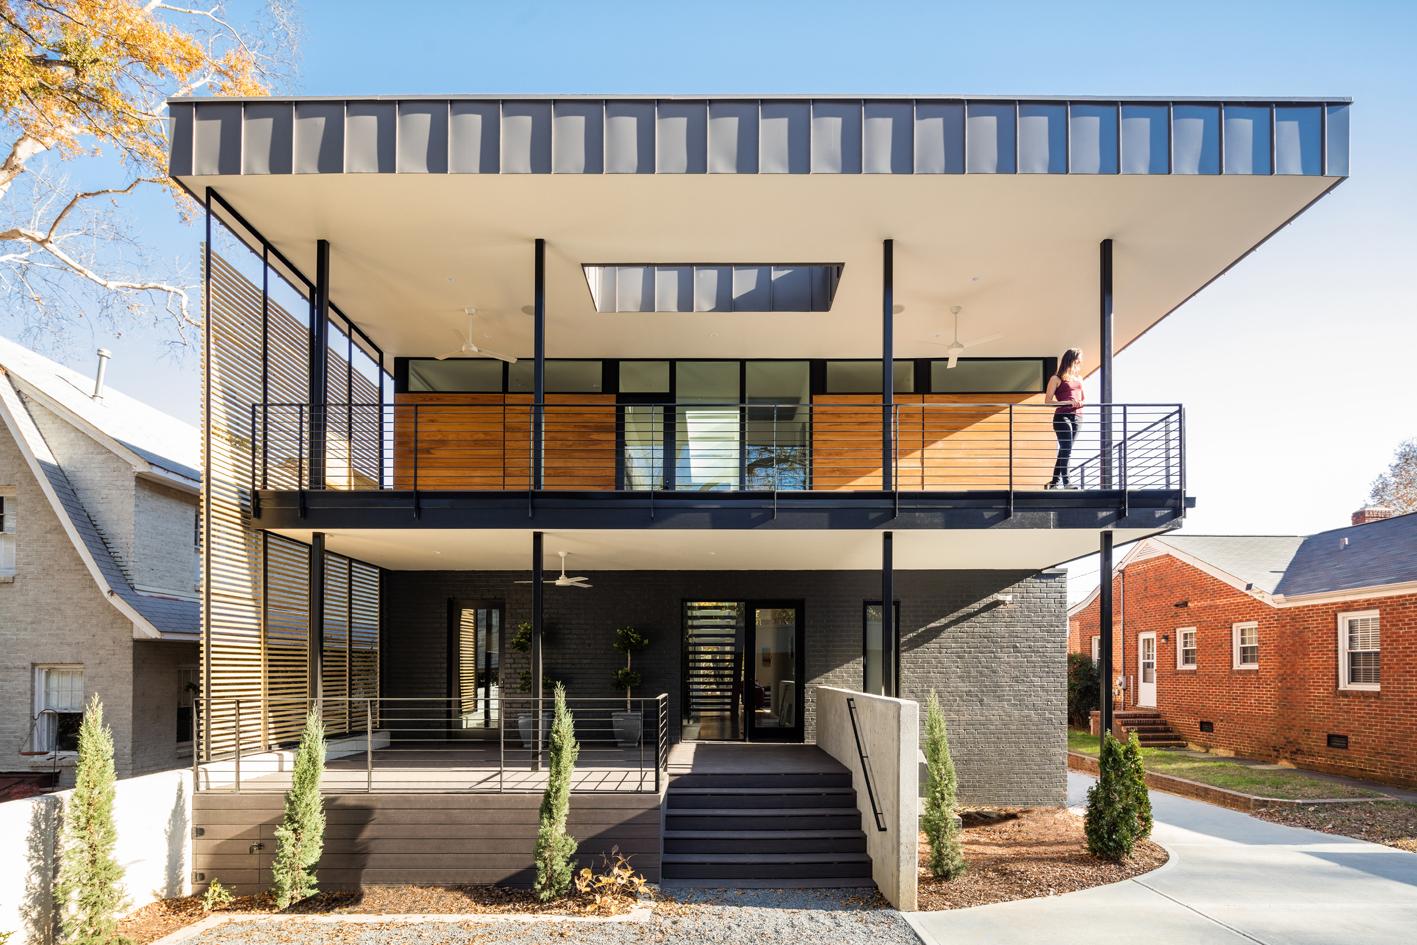 Carroll-Helms Residence